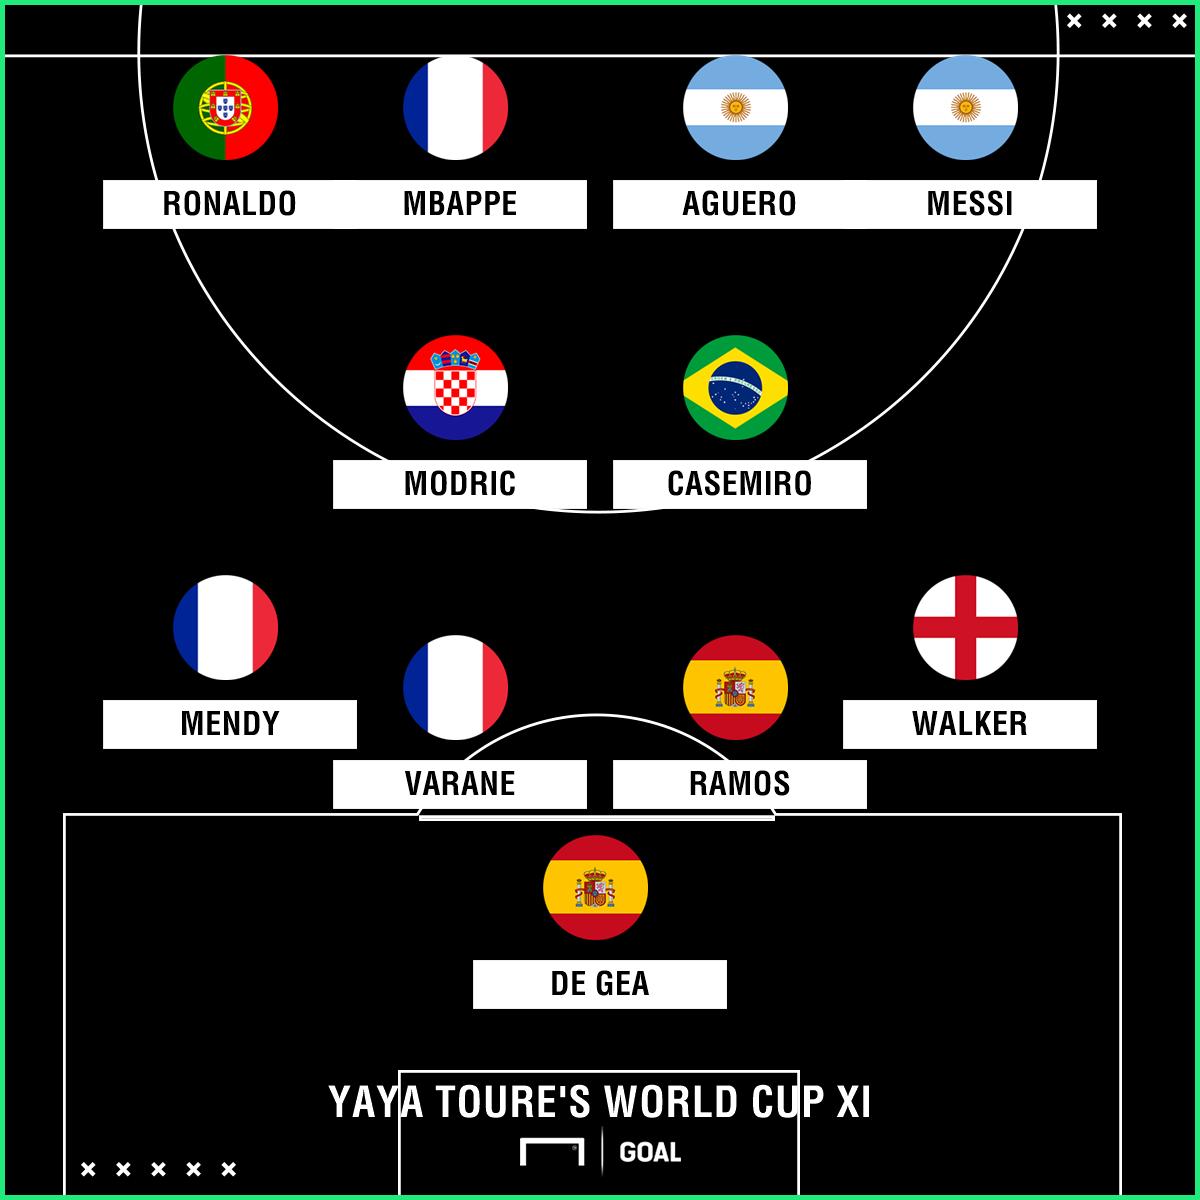 Yaya Toure's World Cup XI